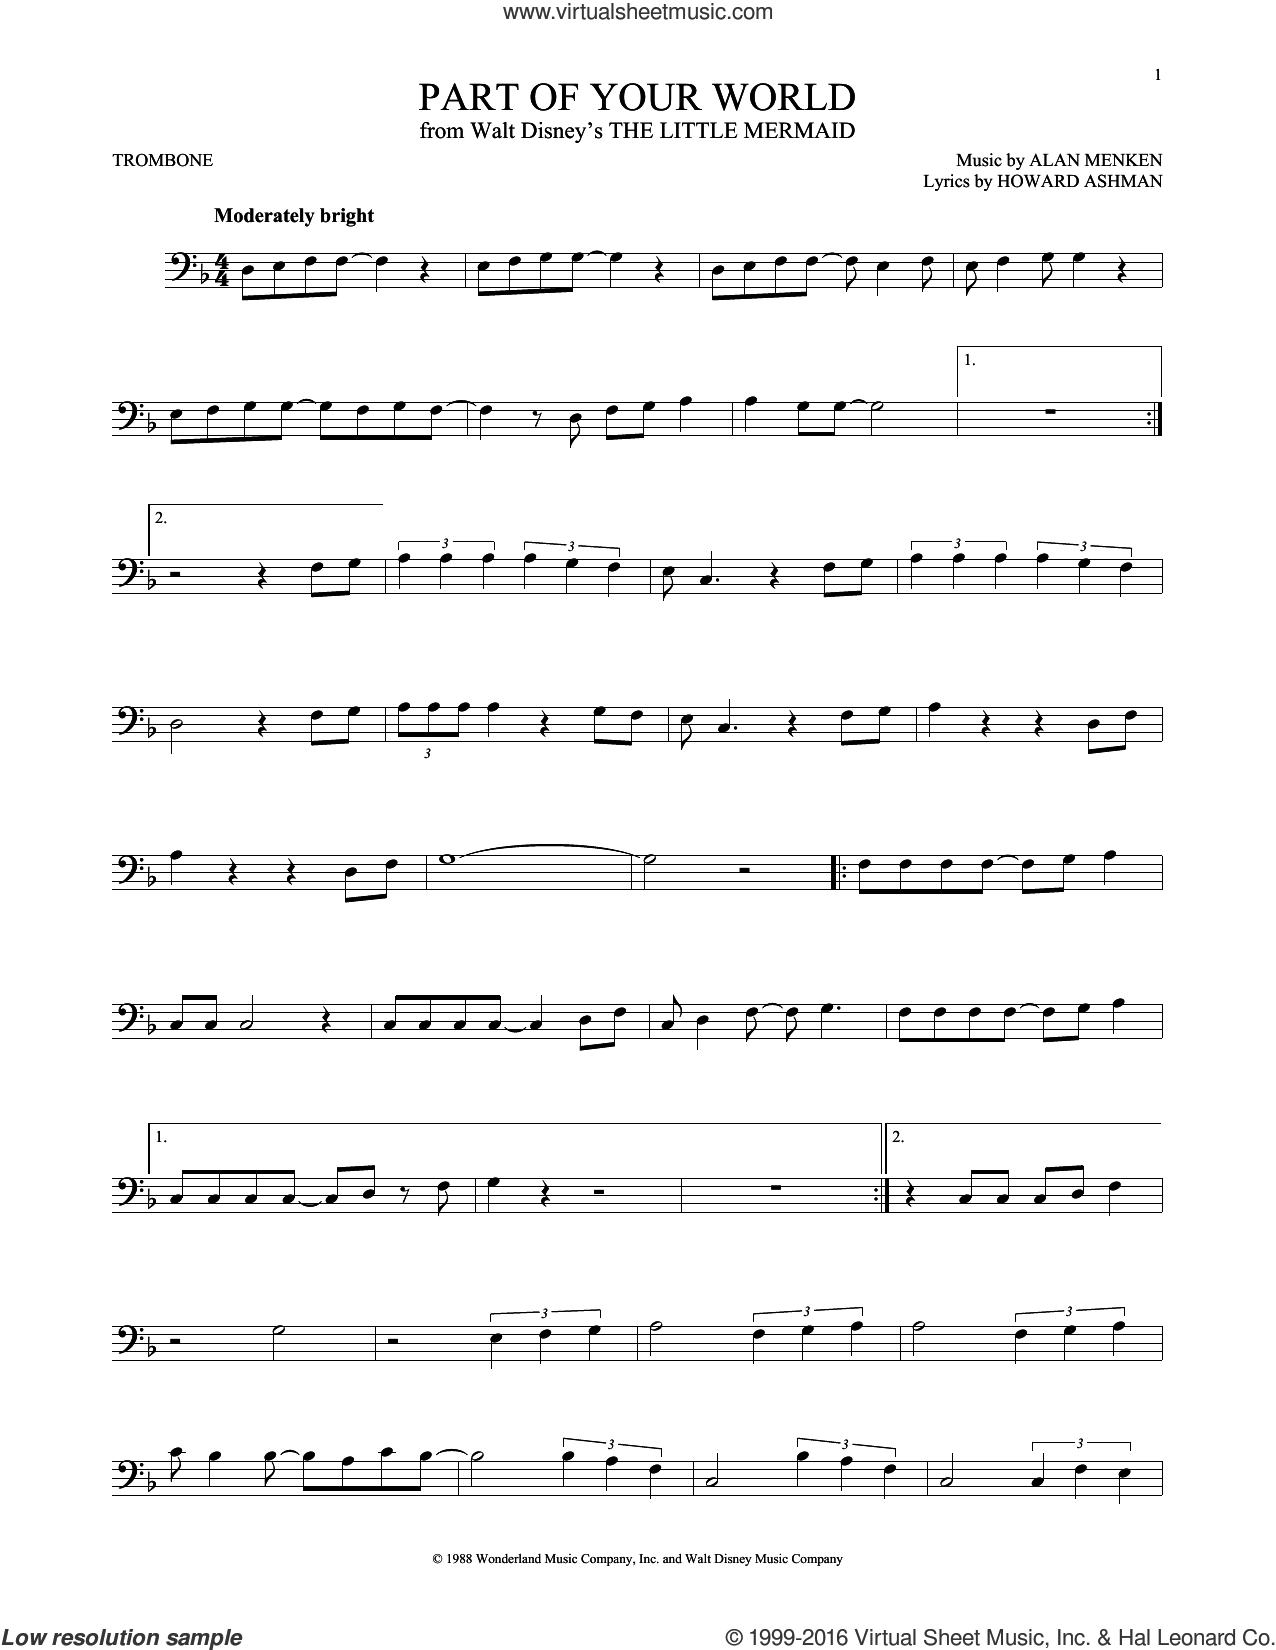 Part Of Your World (from The Little Mermaid) sheet music for trombone solo by Alan Menken, Alan Menken & Howard Ashman and Howard Ashman, intermediate skill level